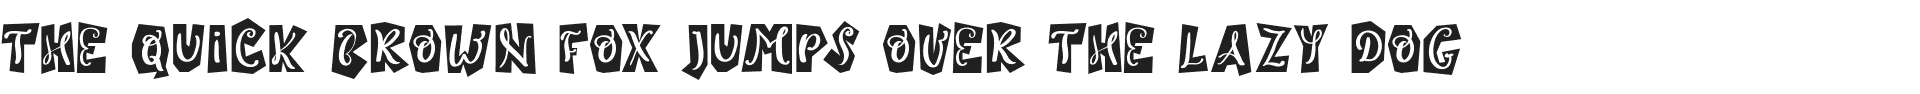 13 Cute Handwritten Fonts Bundle in 2020 - image.php?font=Castillo Bold